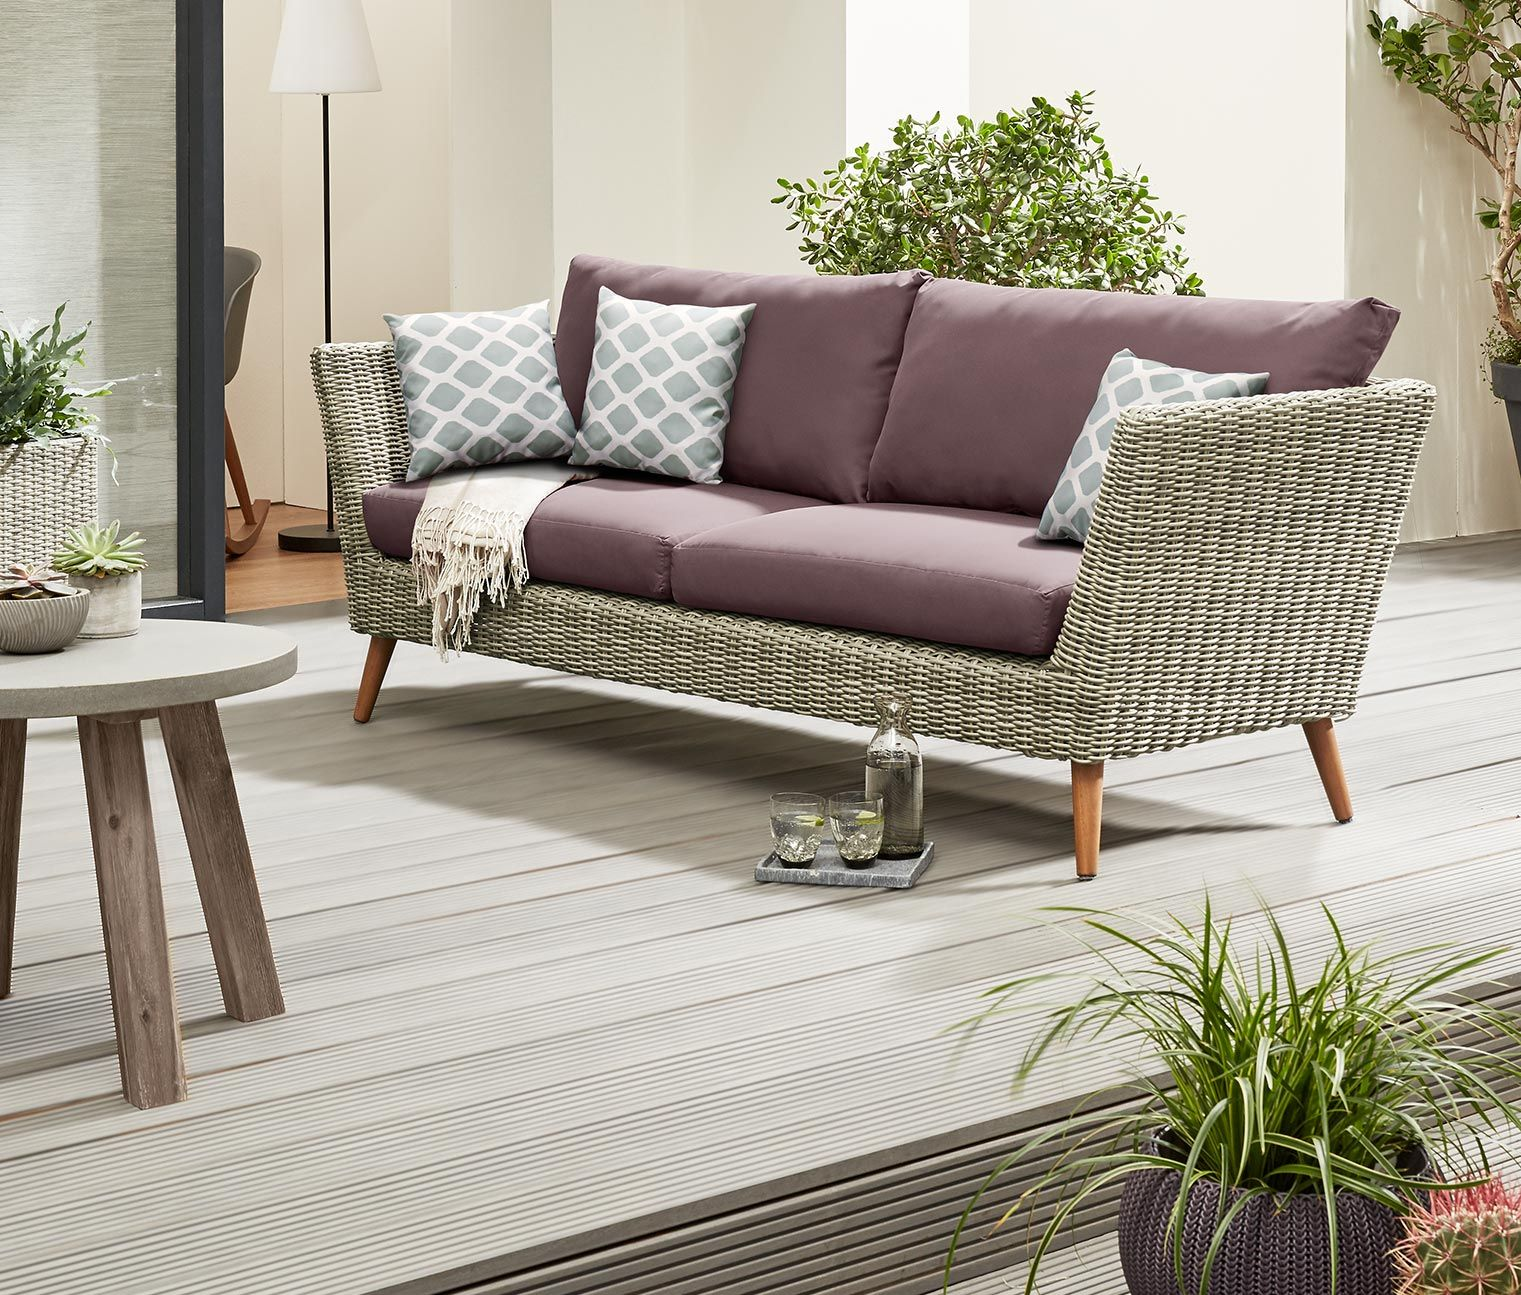 Full Size of Gartensofa Tchibo 3 Sitzer Outdoor Sofa Online Bestellen Bei 336726 Wohnzimmer Gartensofa Tchibo